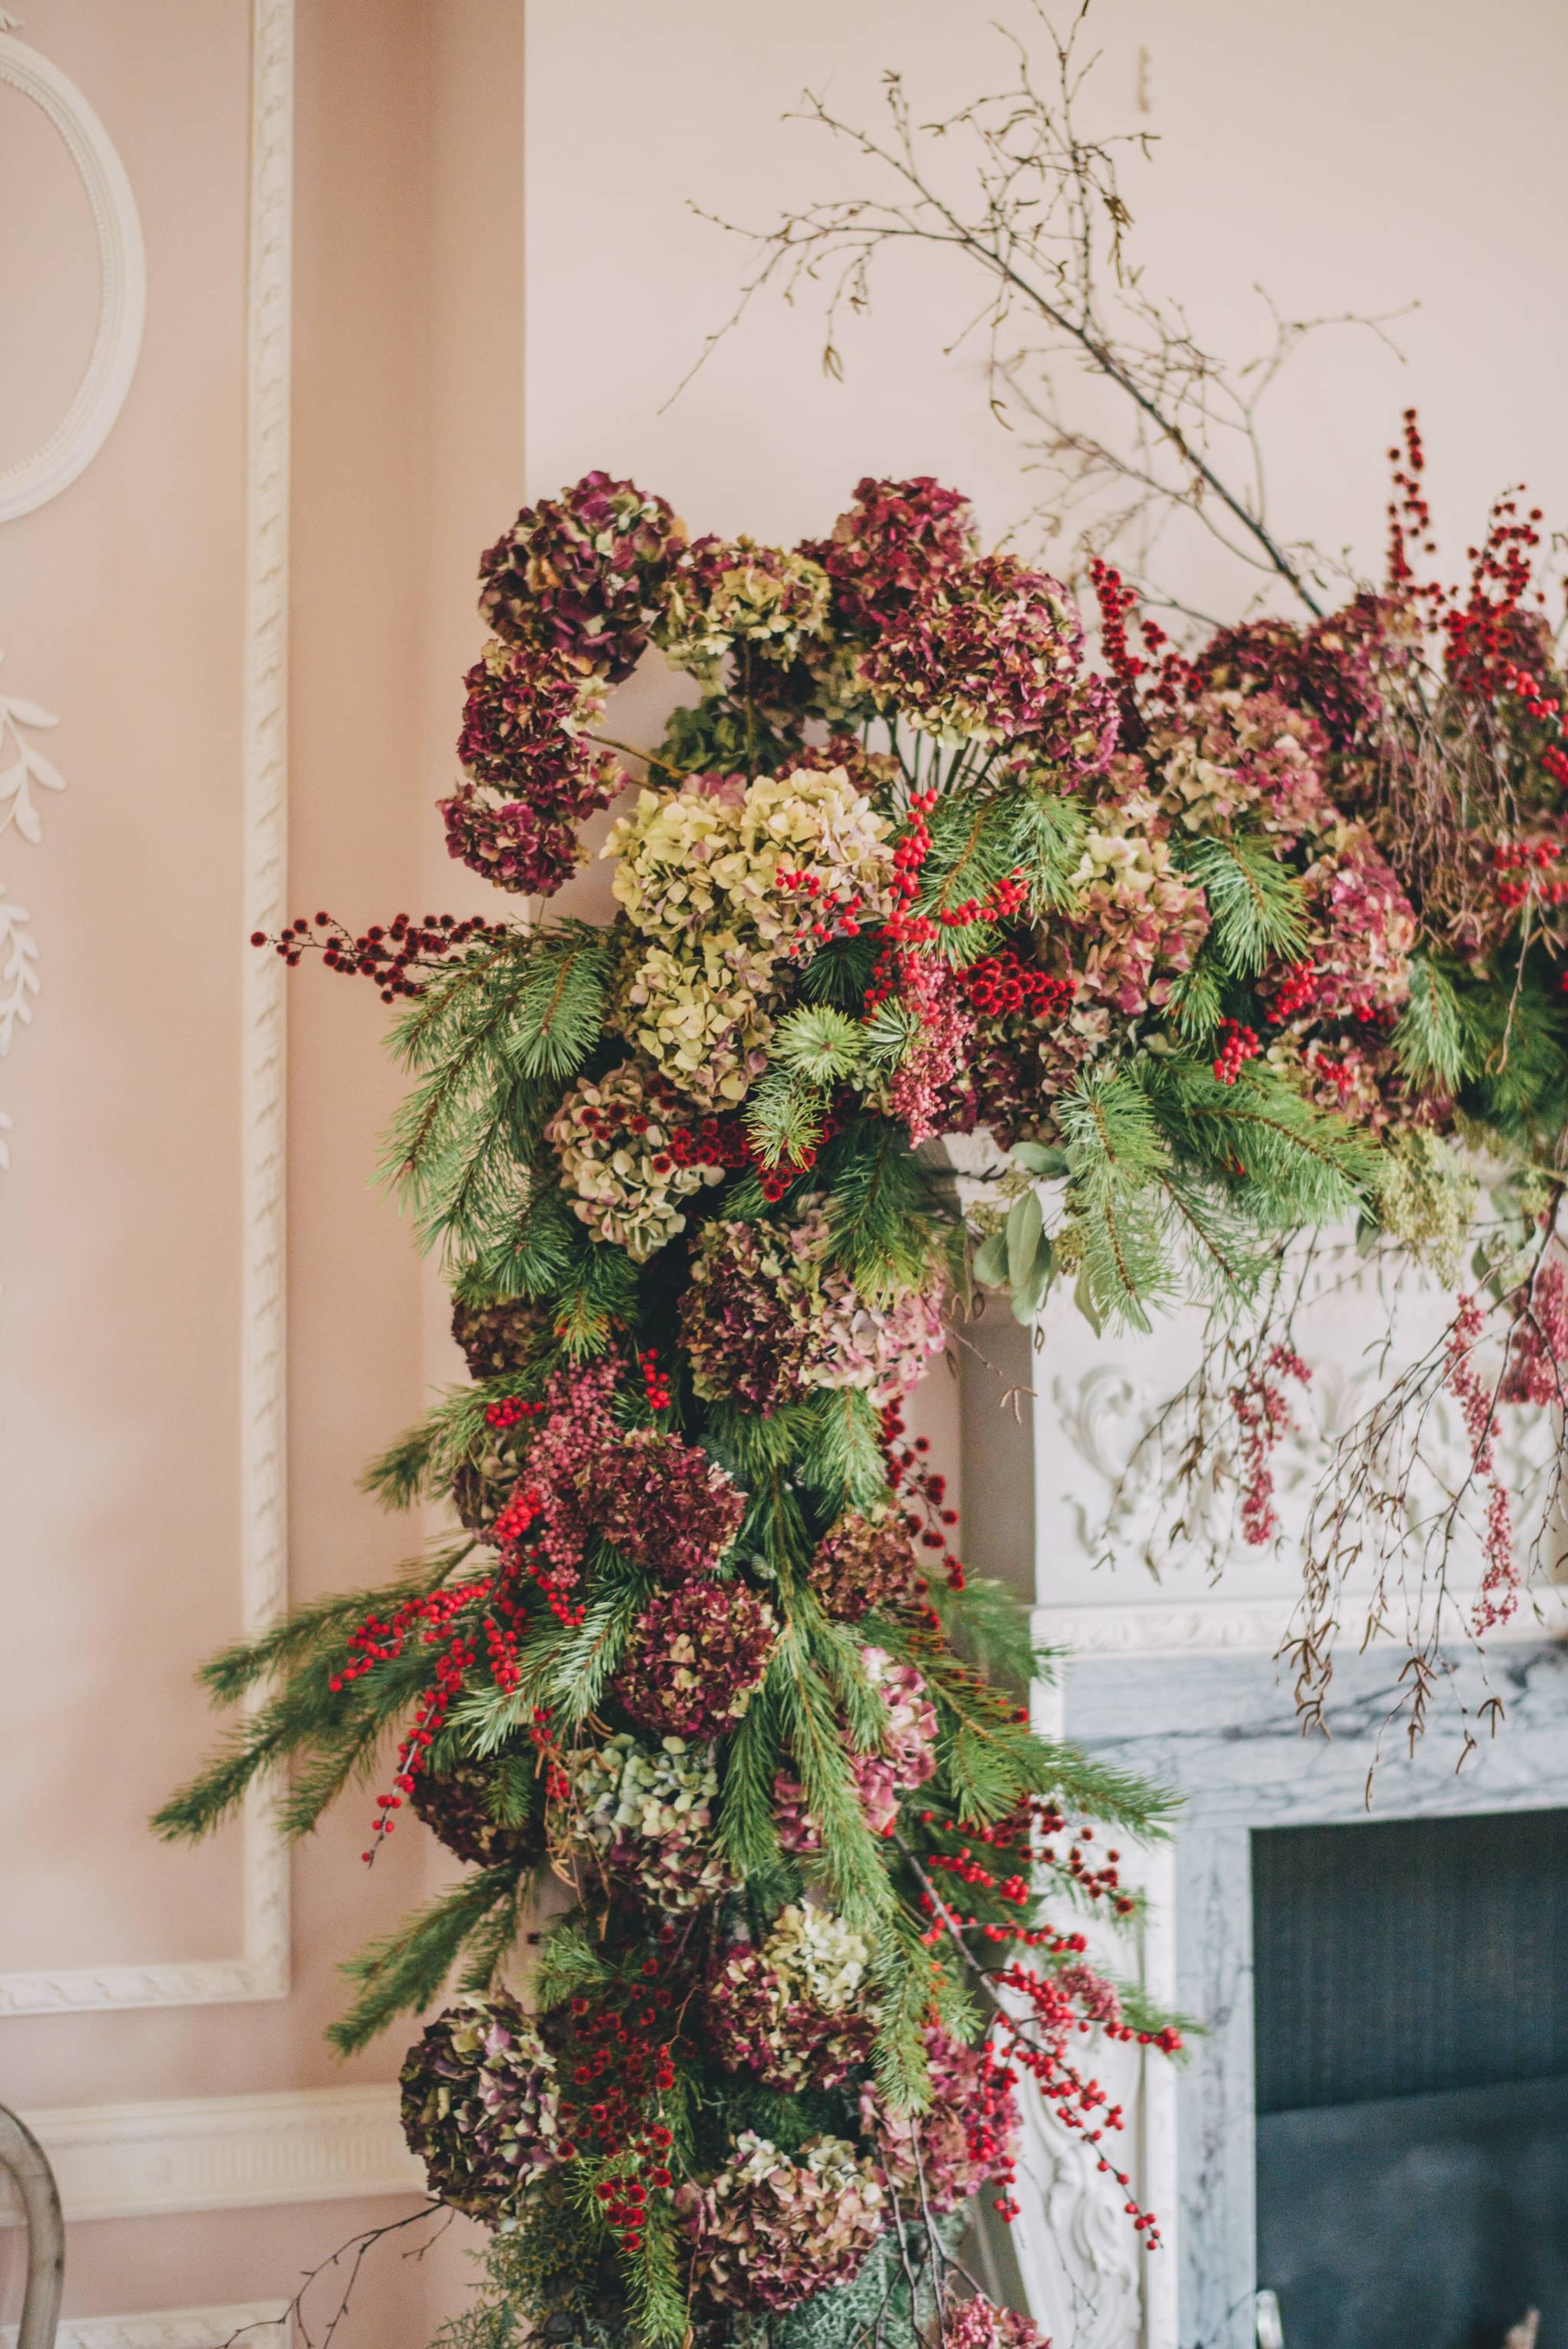 Fresh, romantic ideas for Christmas flower arrangements from florist Kitten Grayson